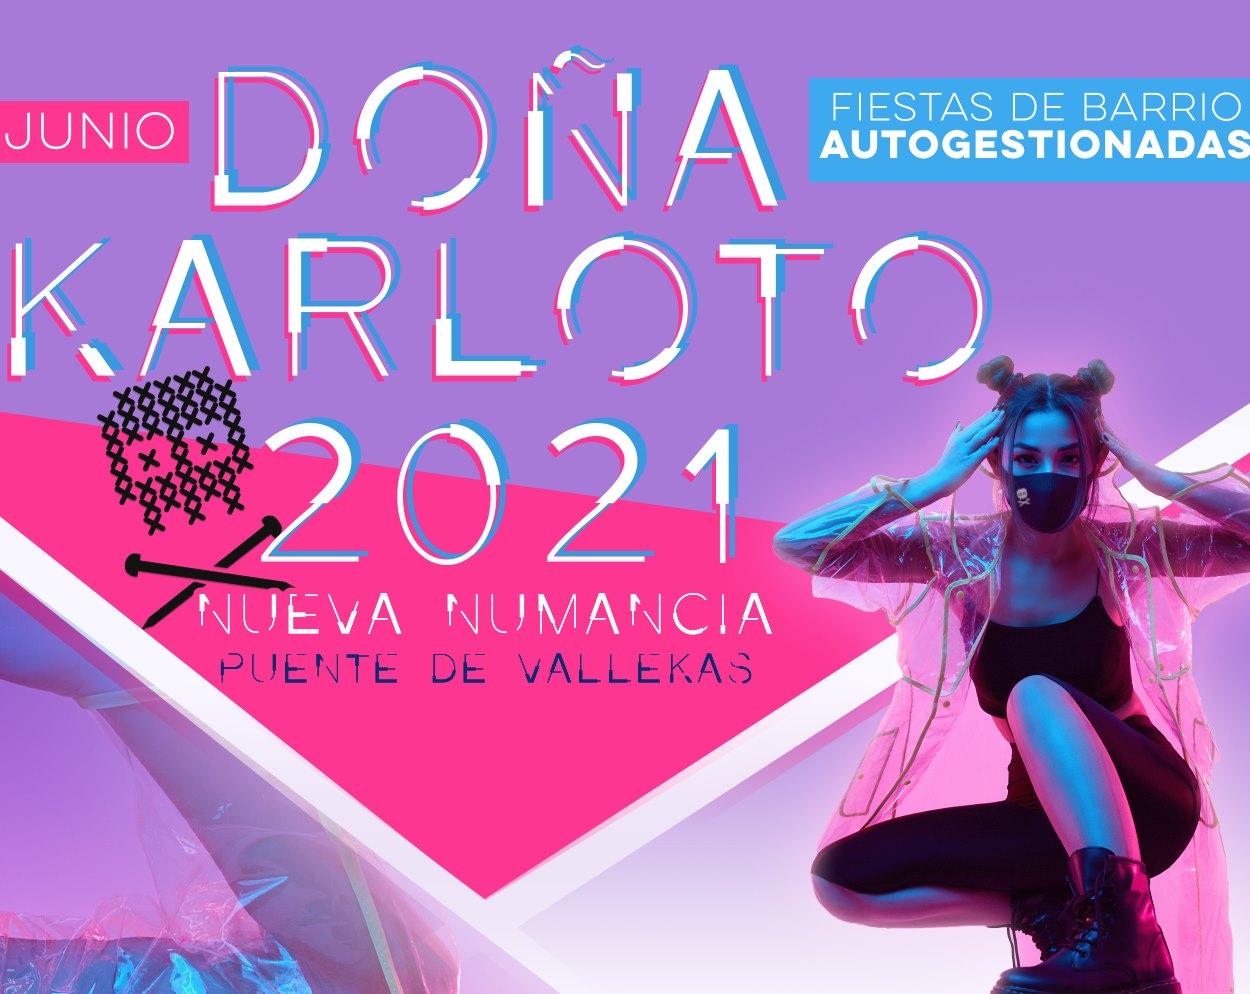 Doña Karloto 2021